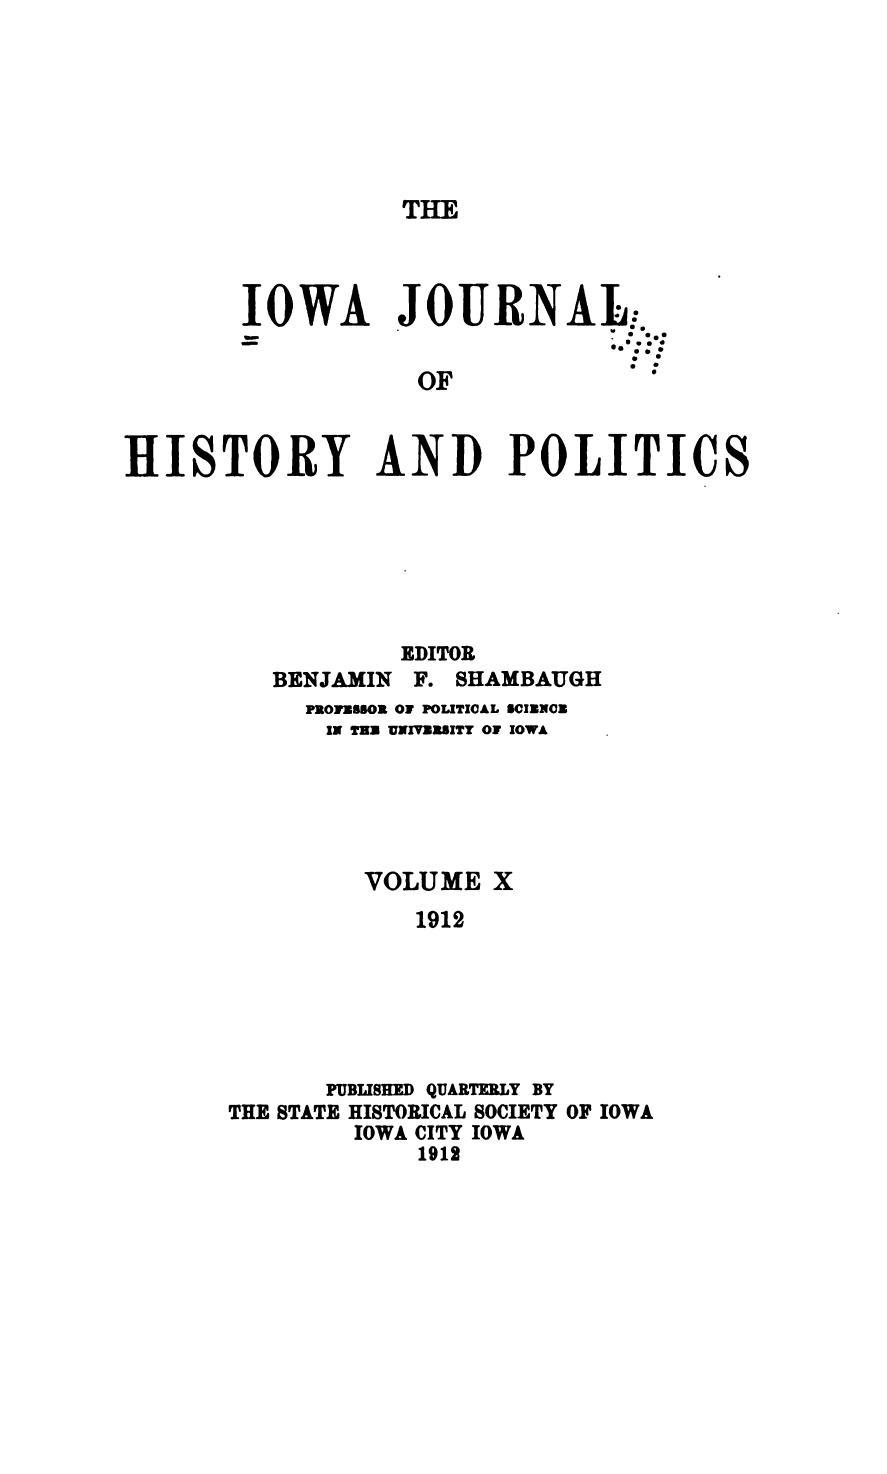 Iowa Journal of History & Politics